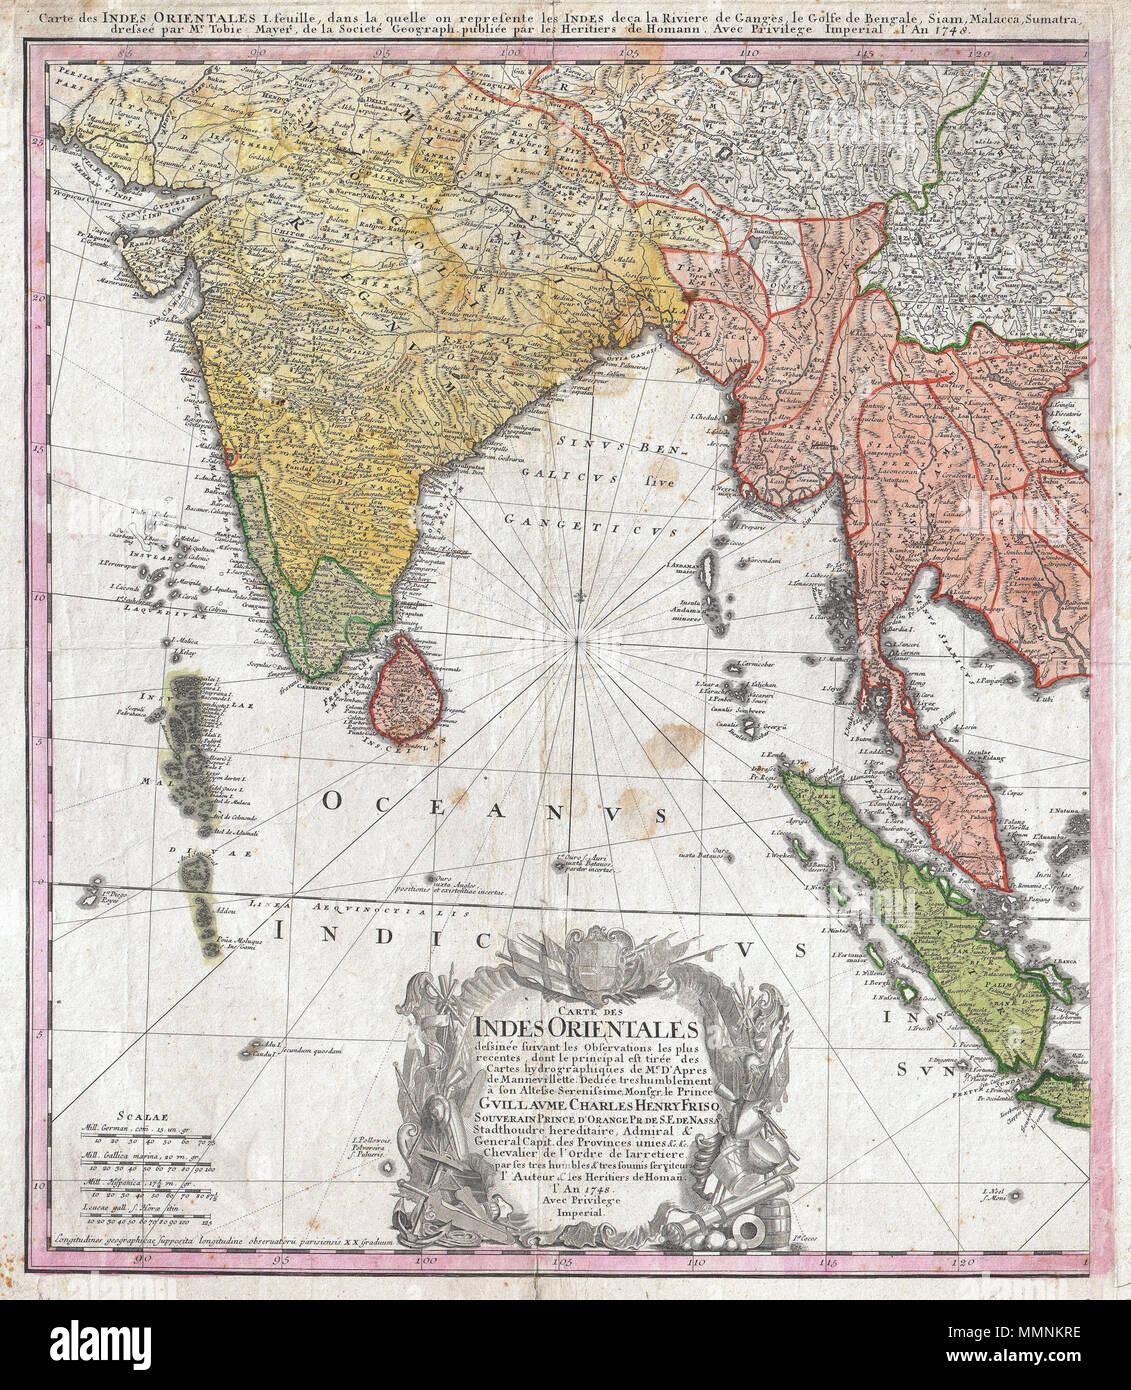 Birmanie Carte Regions.Anglais Un Joli Exemple De L Ouest Feuille De La Heritiers Homann